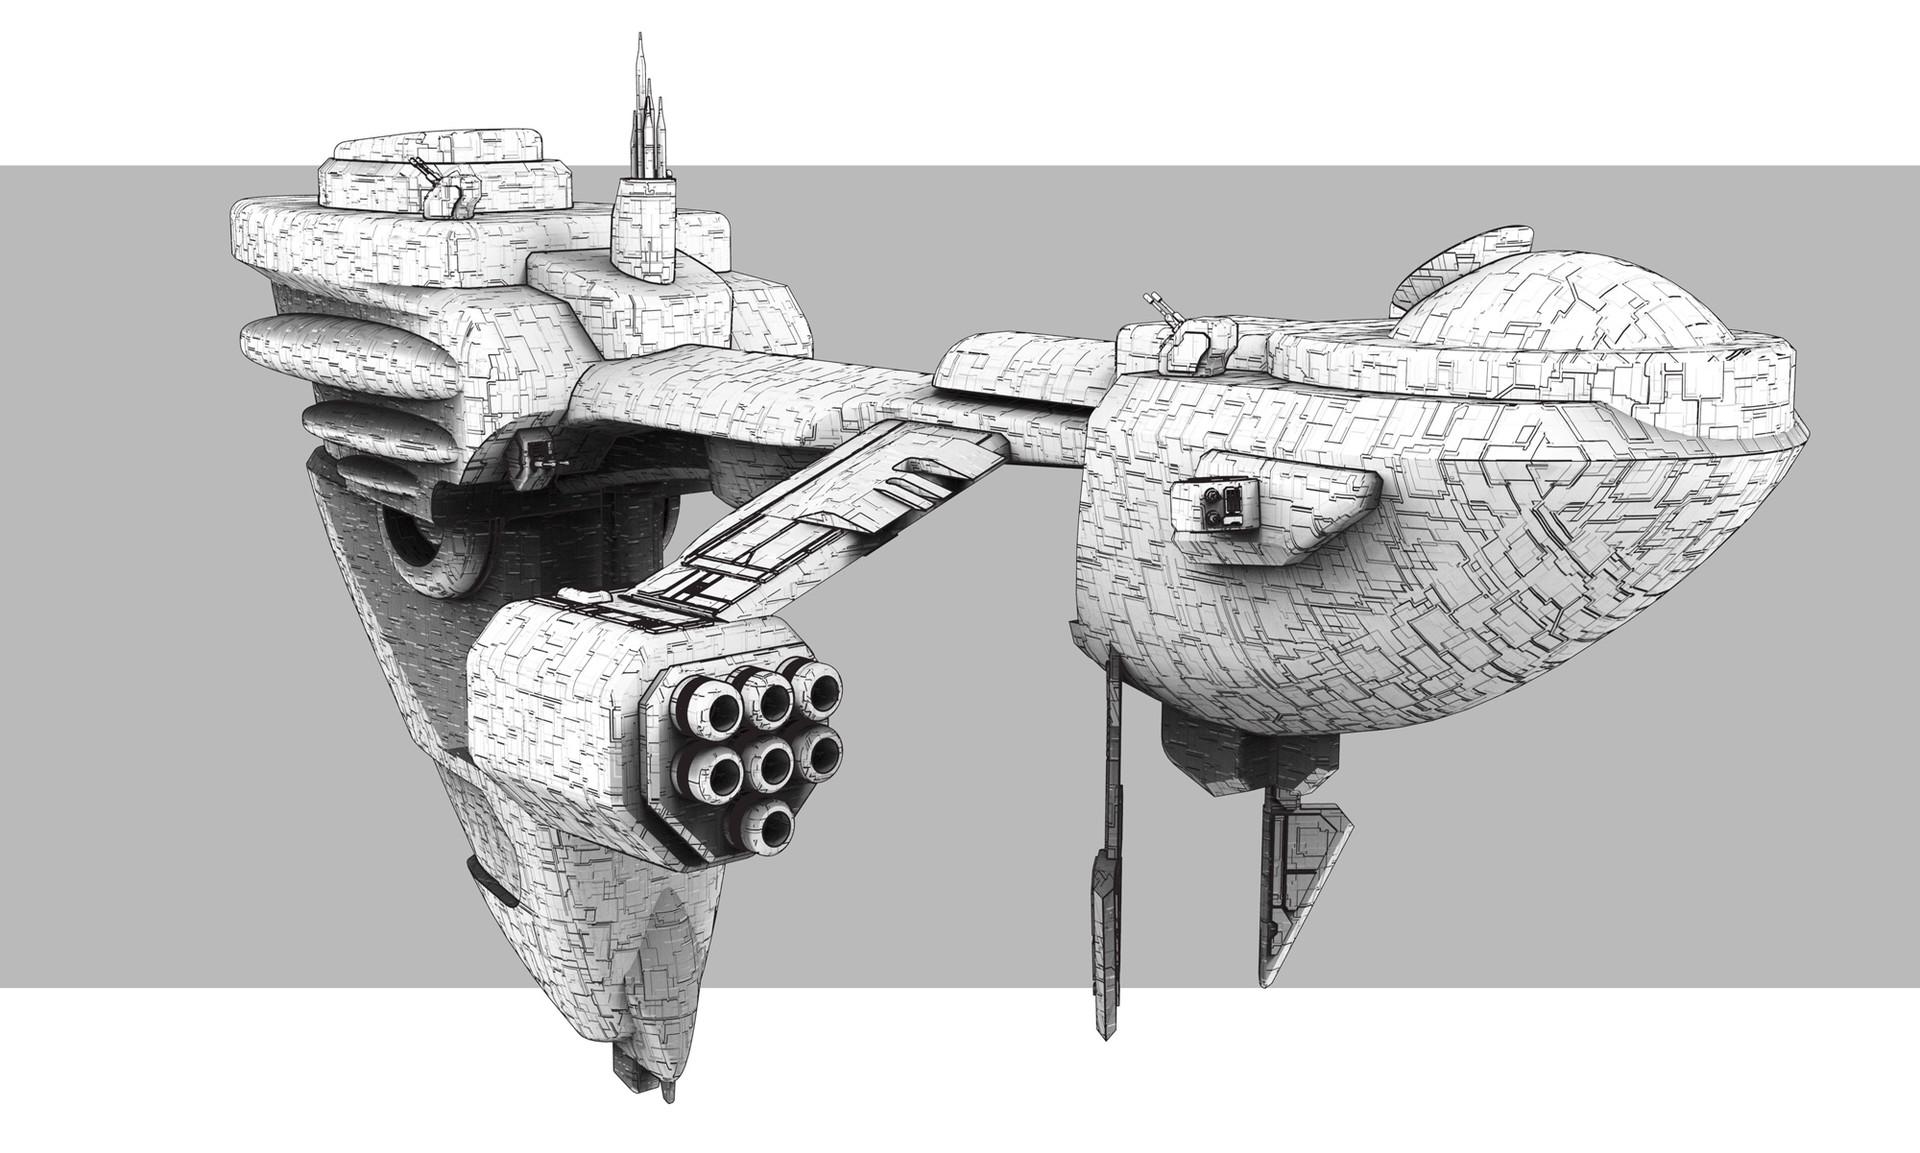 Alejandro gonzalez star wars concept art ef97 b